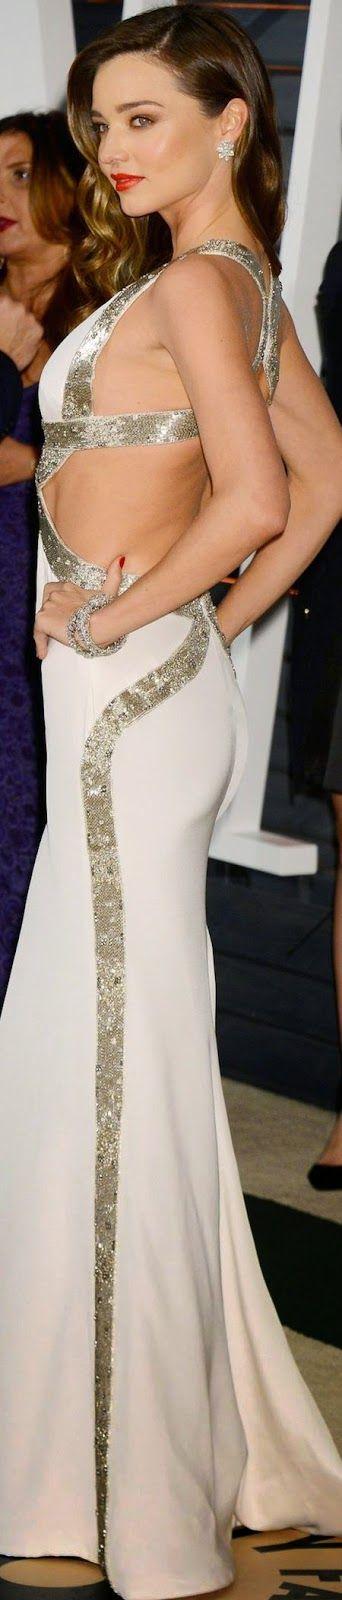 Miranda Kerr 2015 Vanity Fair Oscar Party SILVER.black/white/GOLD BELLADONNALUXEDESIGNS